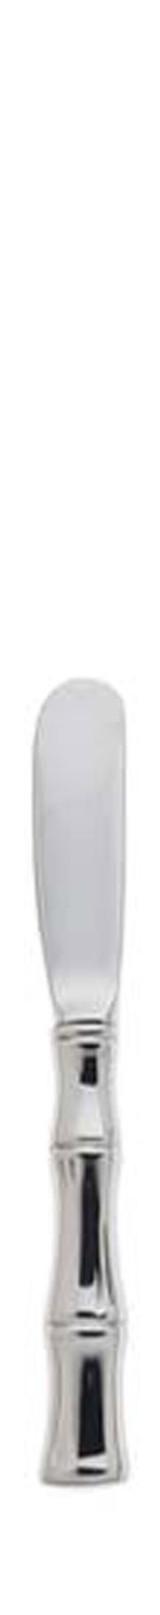 Ricci Argentieri Bamboo Butter Spreader MPN: 10134 UPC: 644907101349